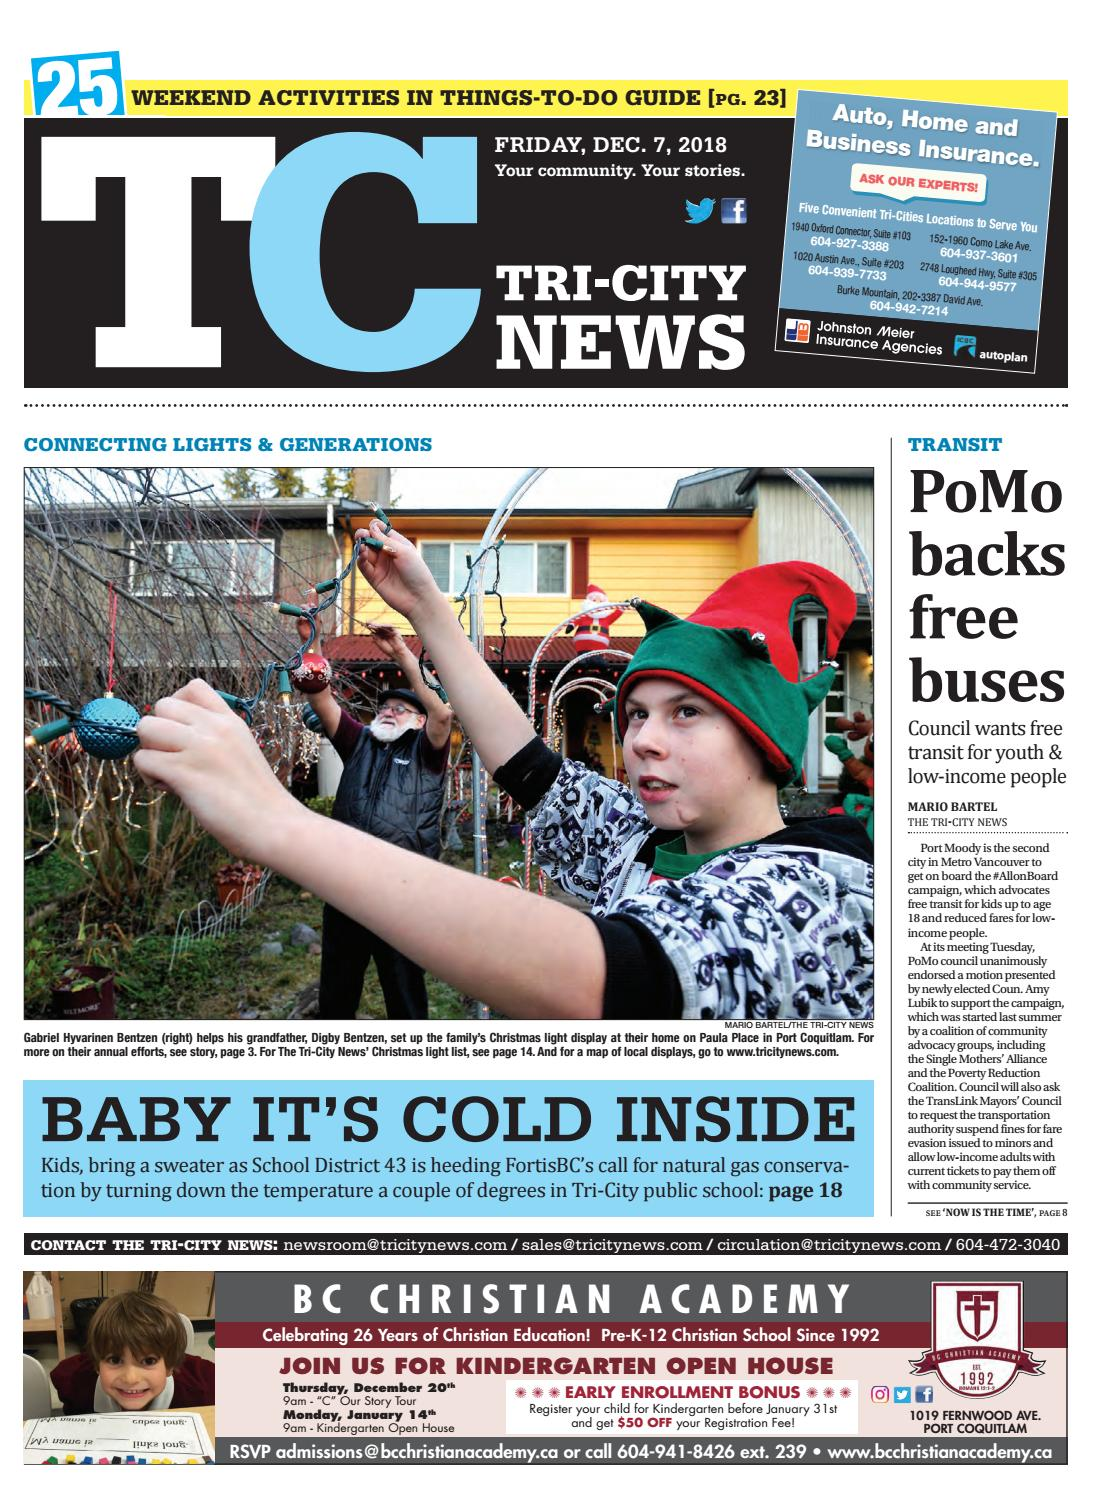 promo code c0414 c21fa Tri-City News December 7 2018 by Tri-City News - issuu